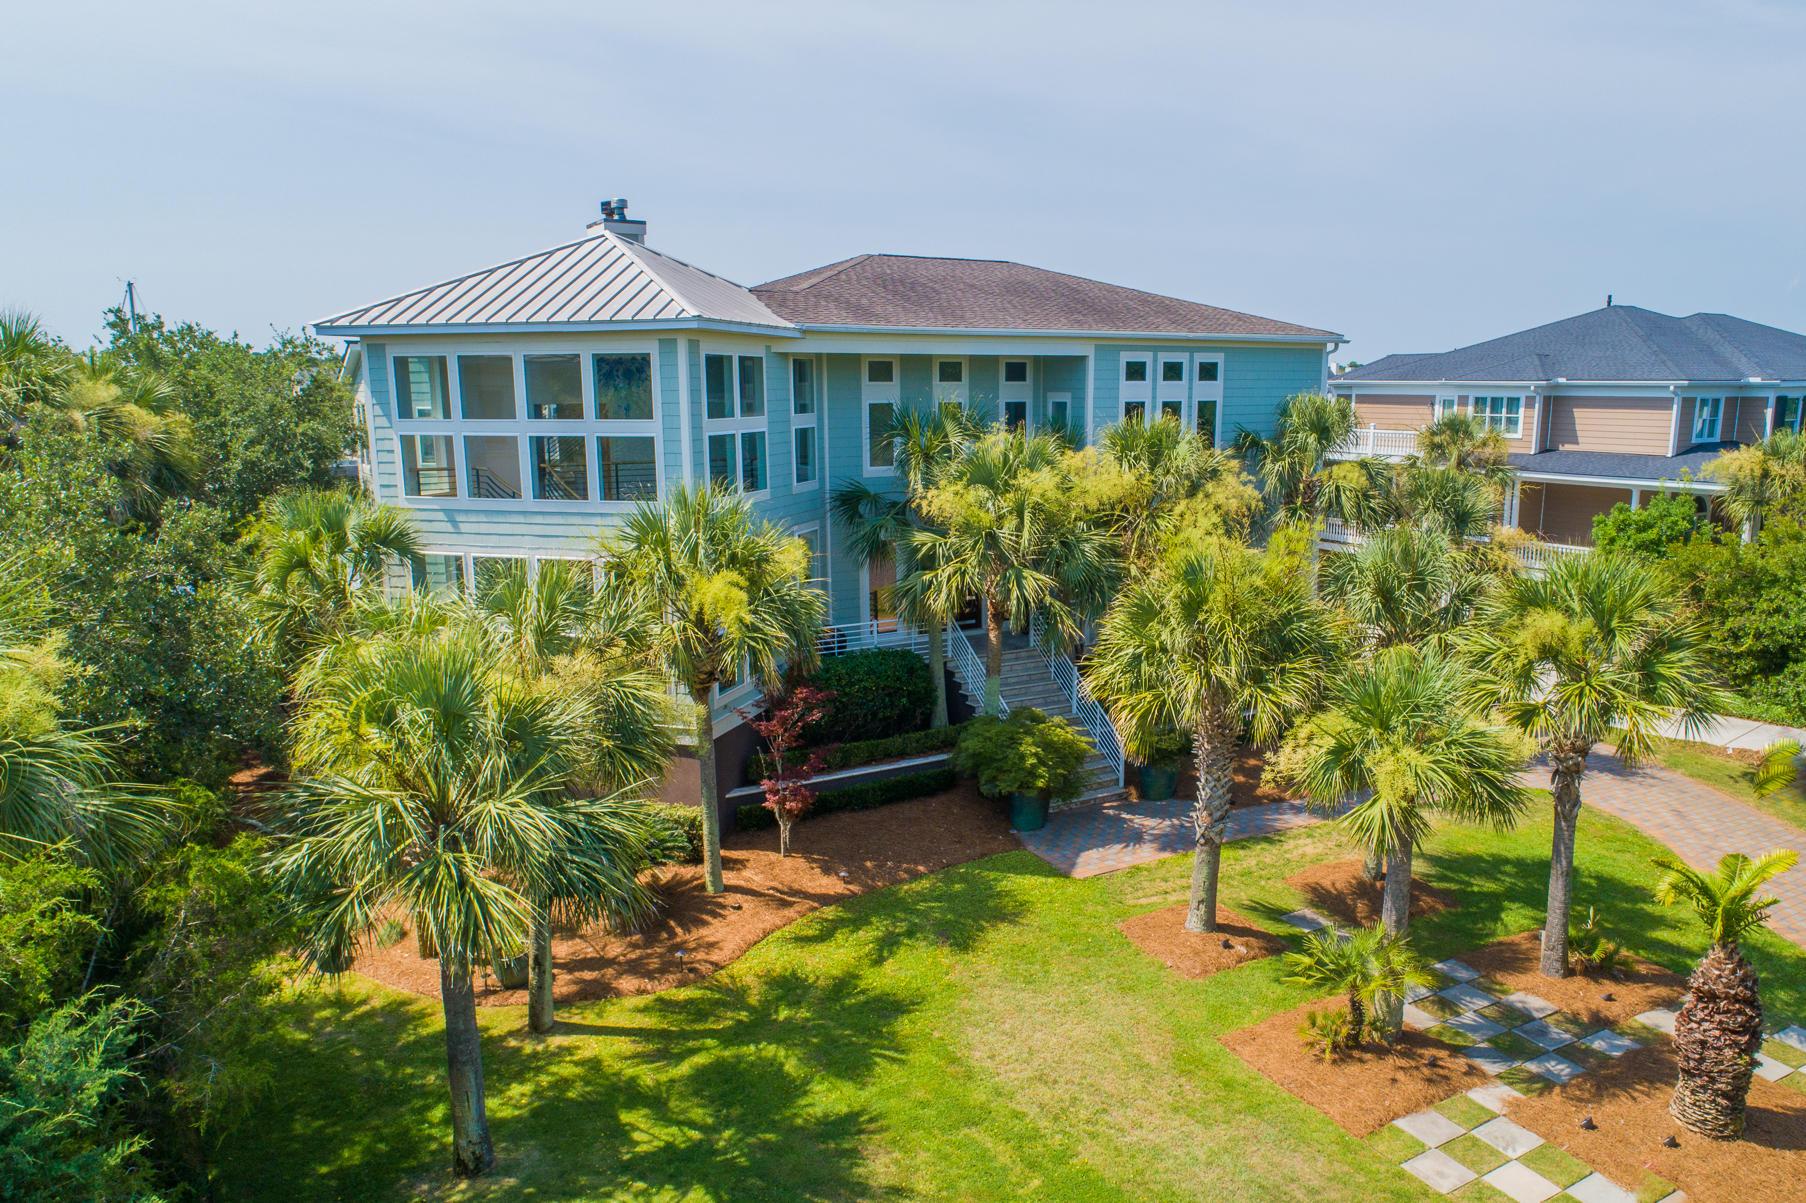 Wild Dunes Homes For Sale - 39 Waterway Island, Isle of Palms, SC - 24